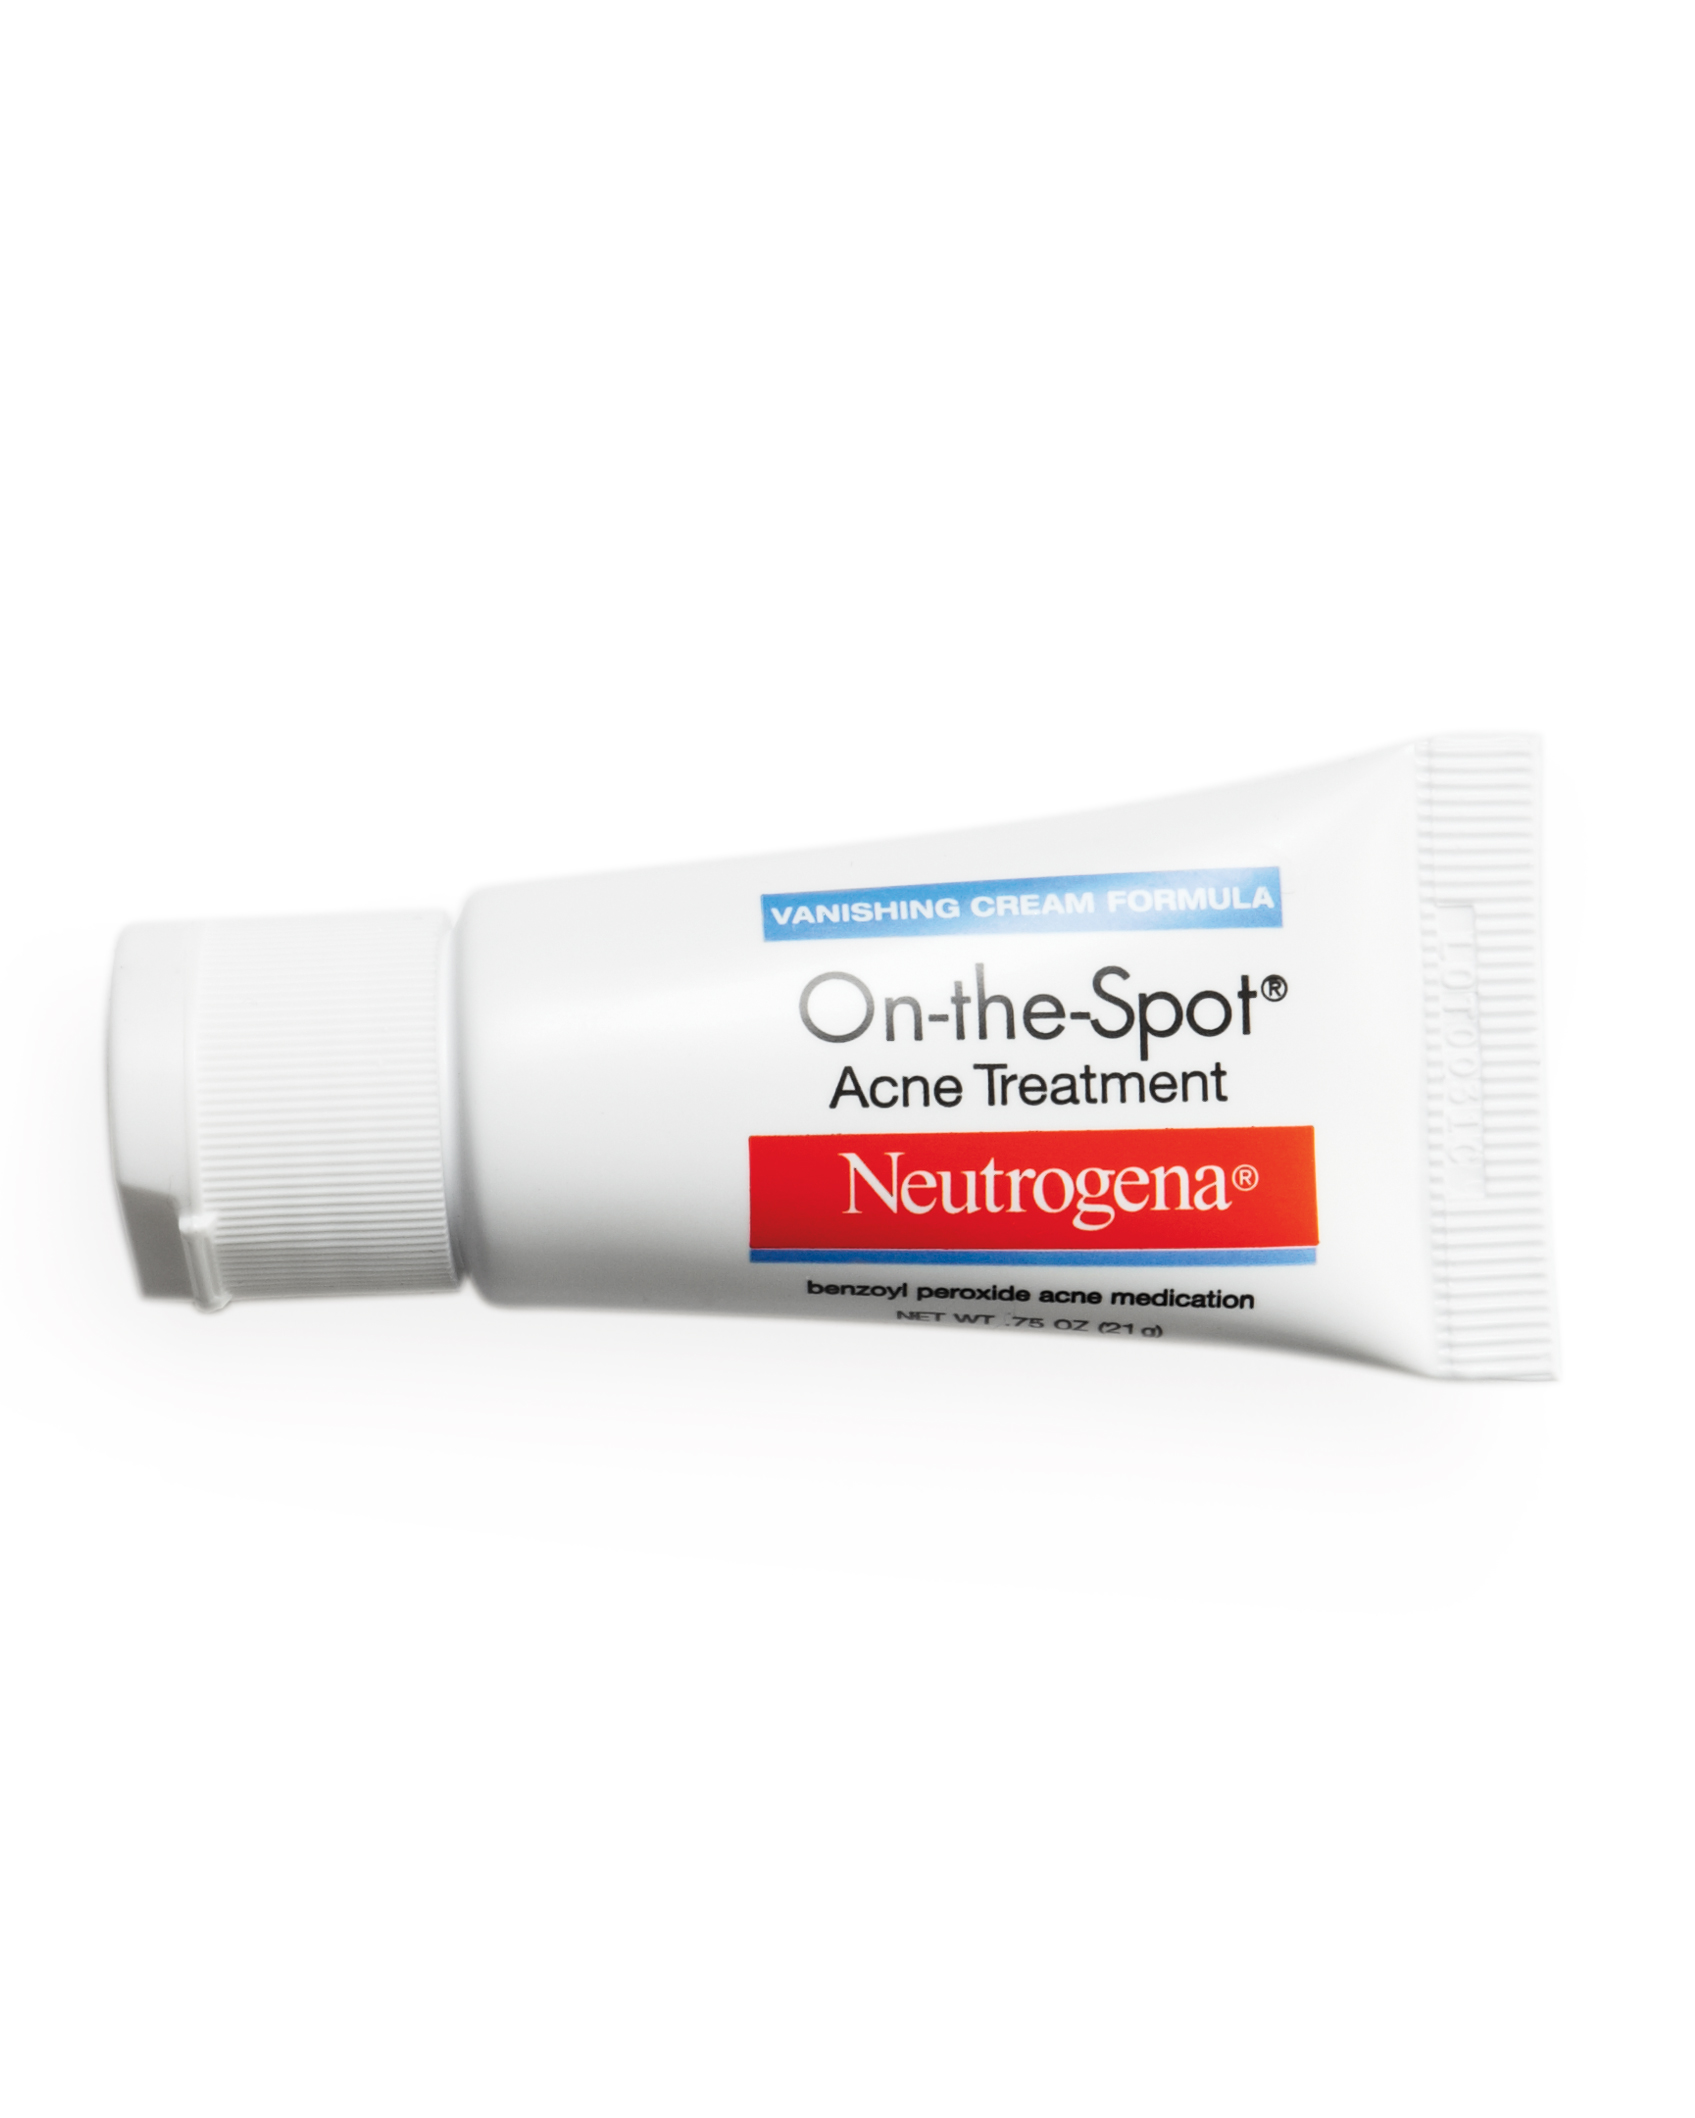 neutrogena-acne-treatment-002-mwd109767.jpg